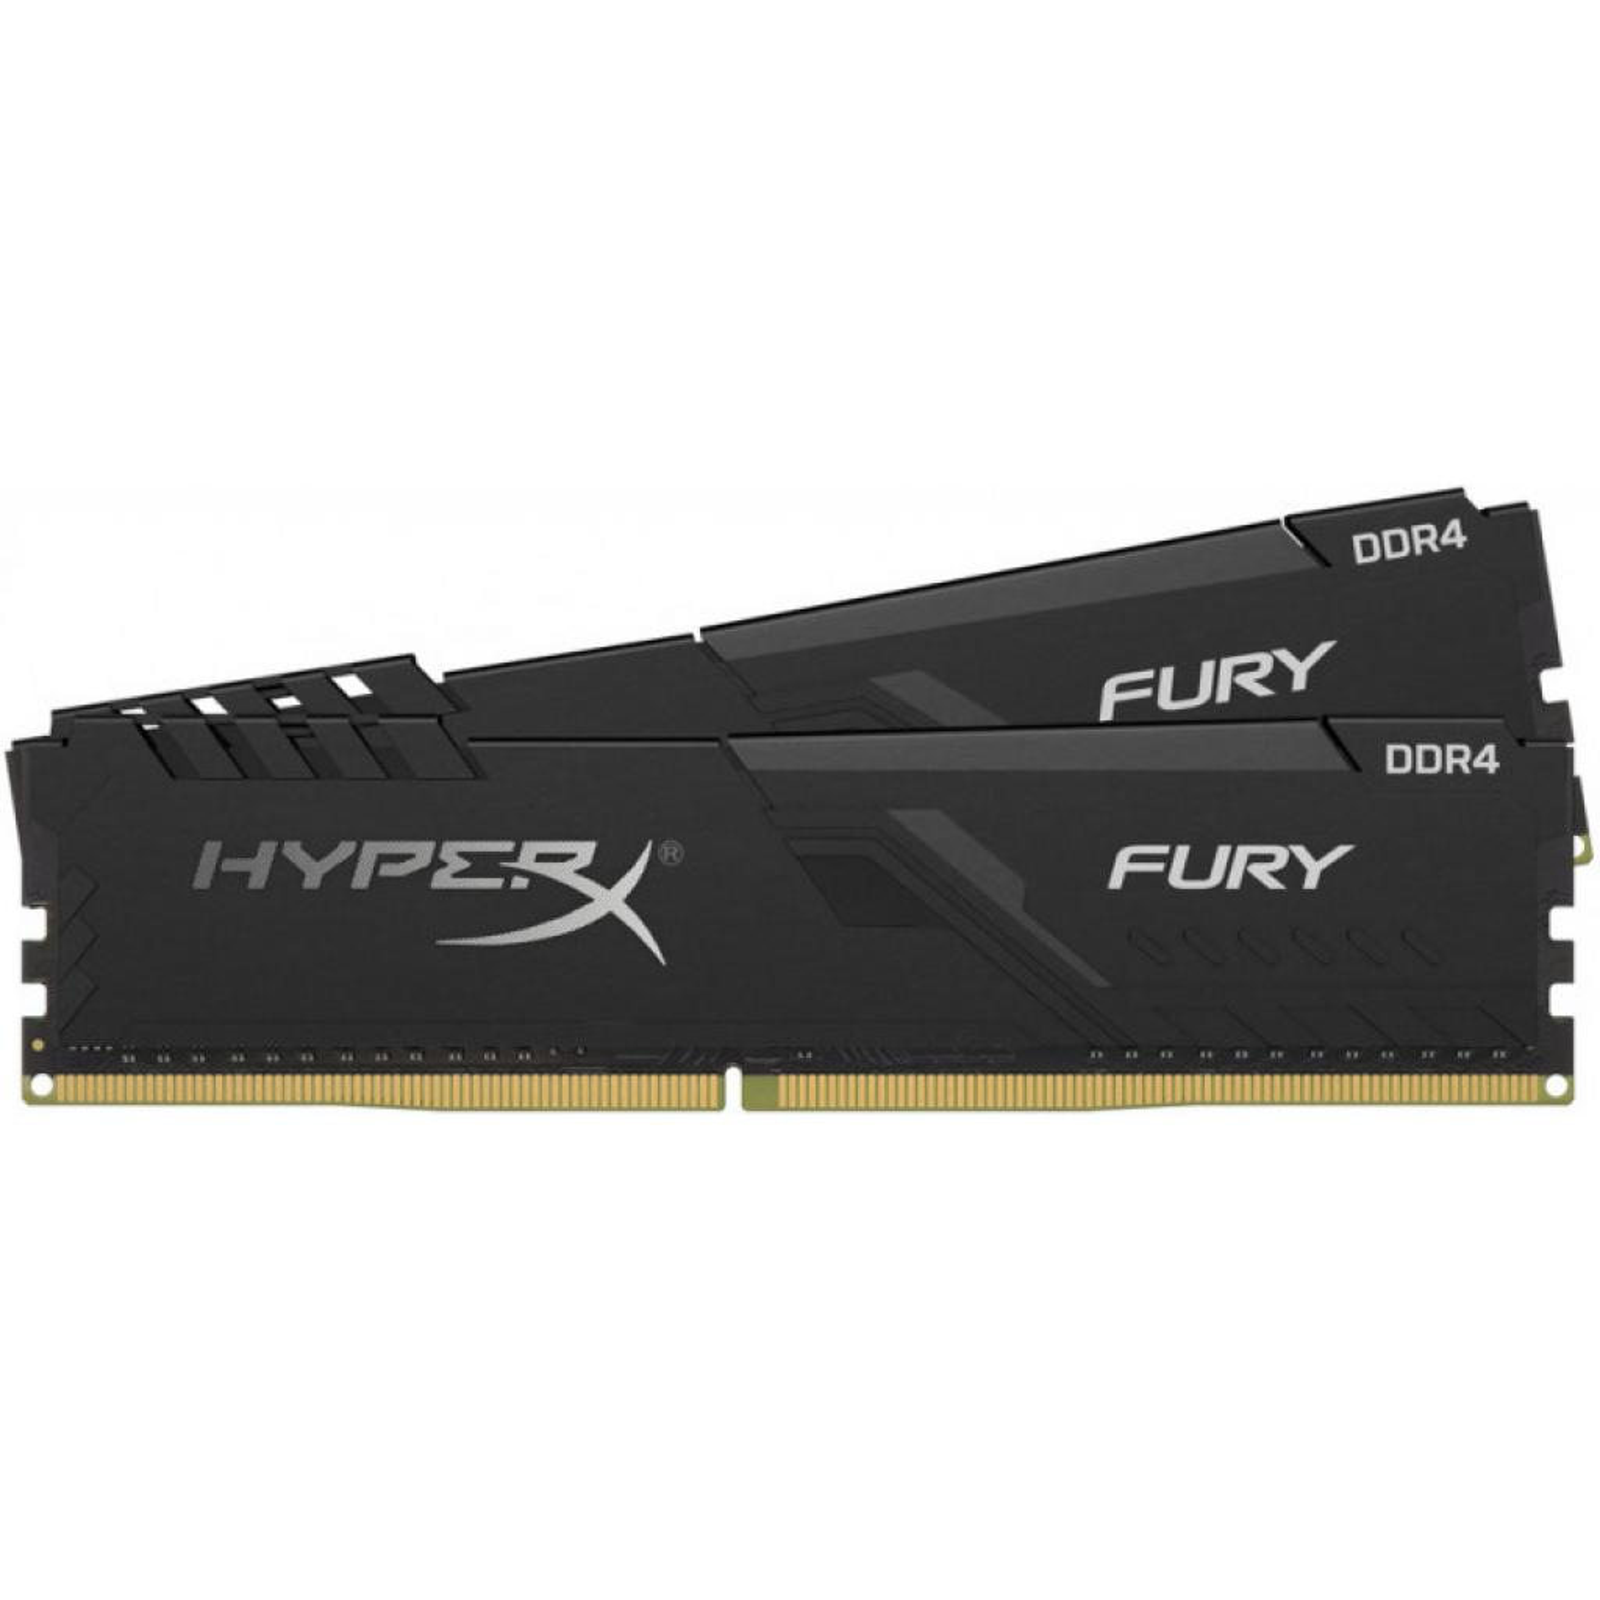 Модуль памяти для компьютера DDR4 8GB (2x4GB) 2400 MHz HyperX Fury Black HyperX (Kingston Fury) (HX424C15FB3K2/8) изображение 2